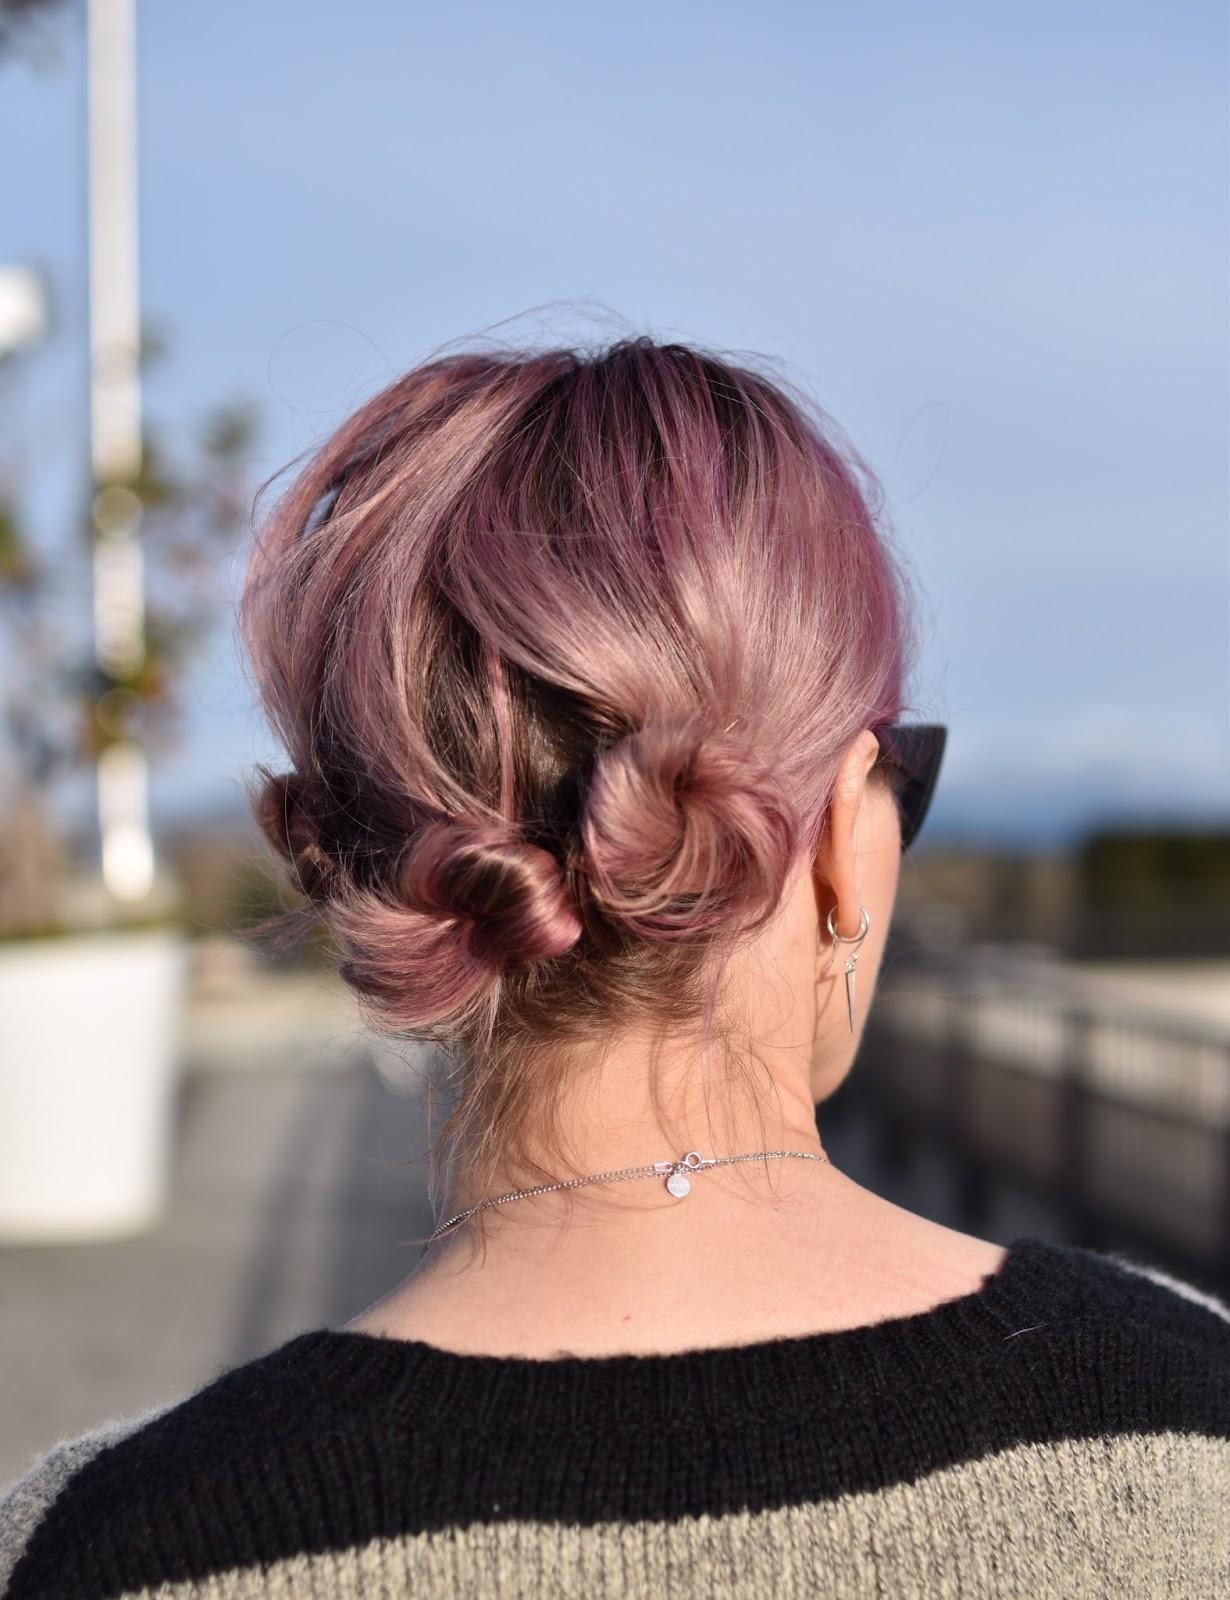 Monika Faulkner outfit inspiration - pink hair updo